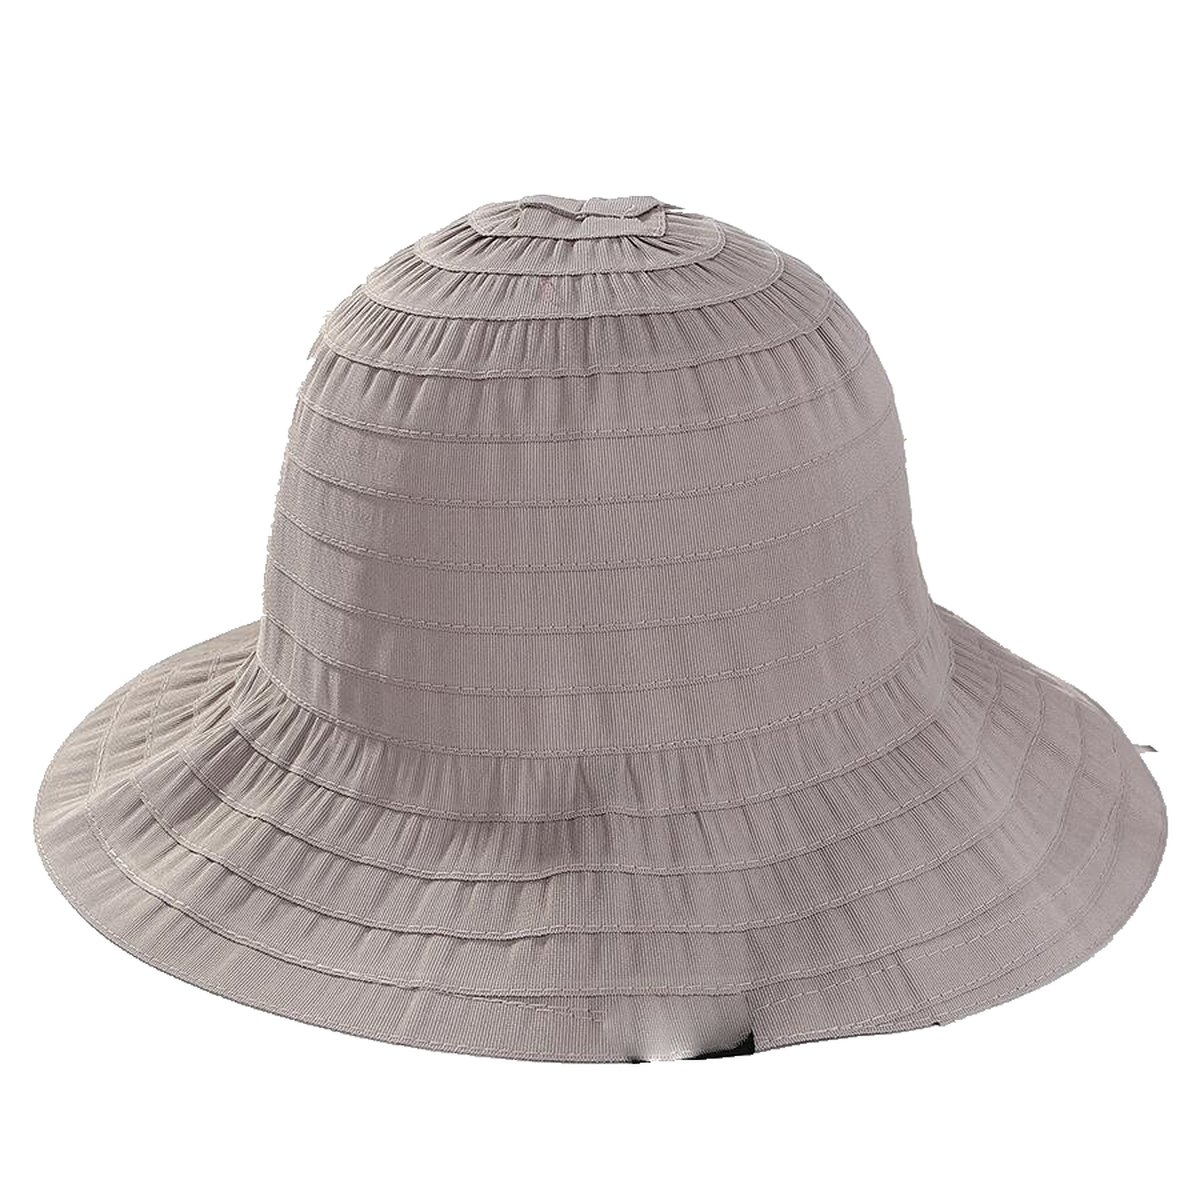 Wide Brim Sun Hat Ladies Church Wedding Floral French Cap Beach Vacation Visor